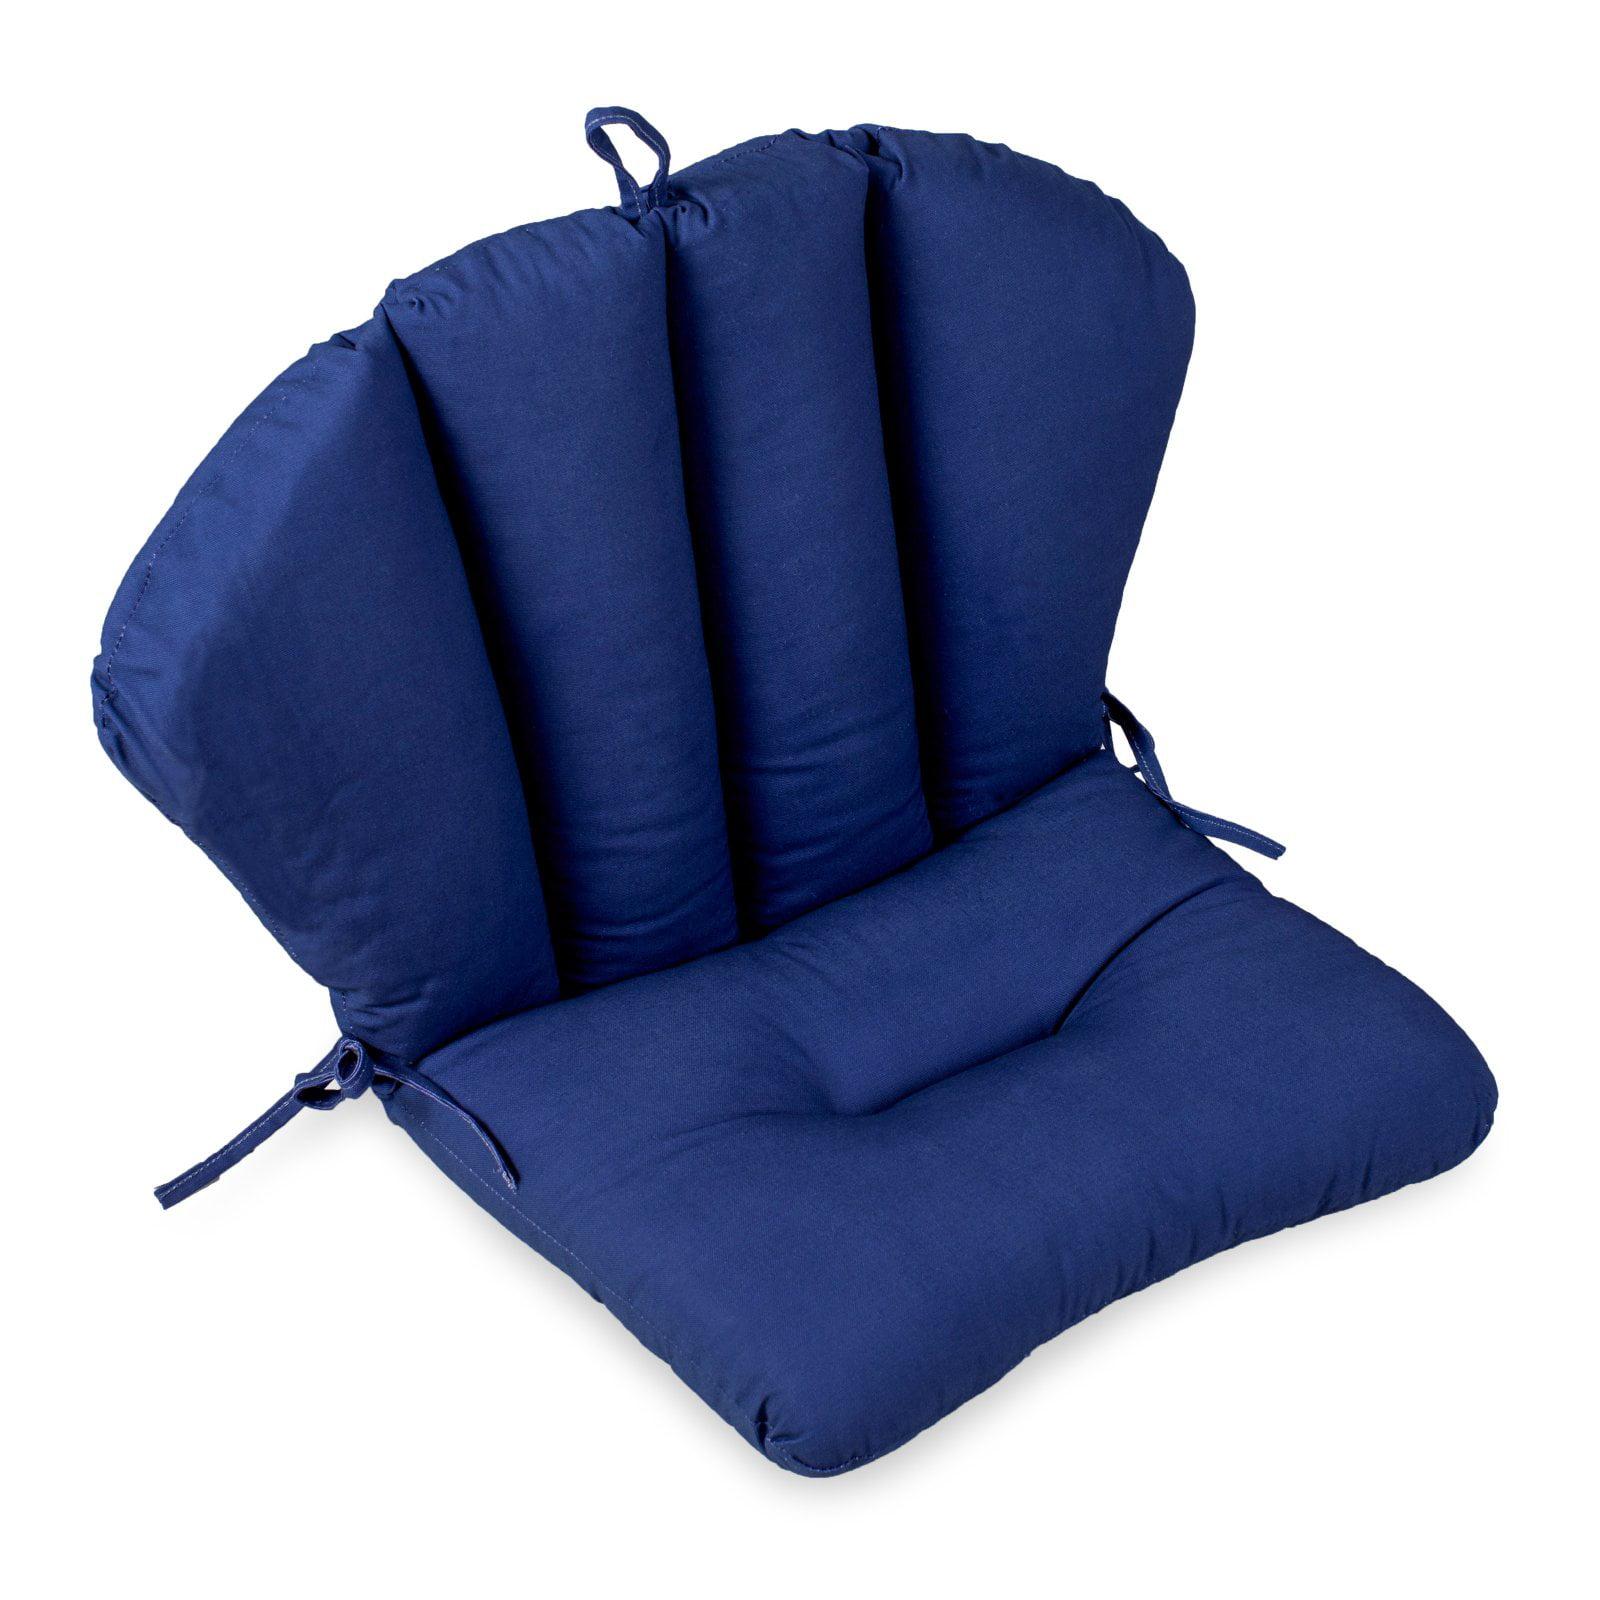 Coral Coast Geo Barrel Back Outdoor Chair Cushion